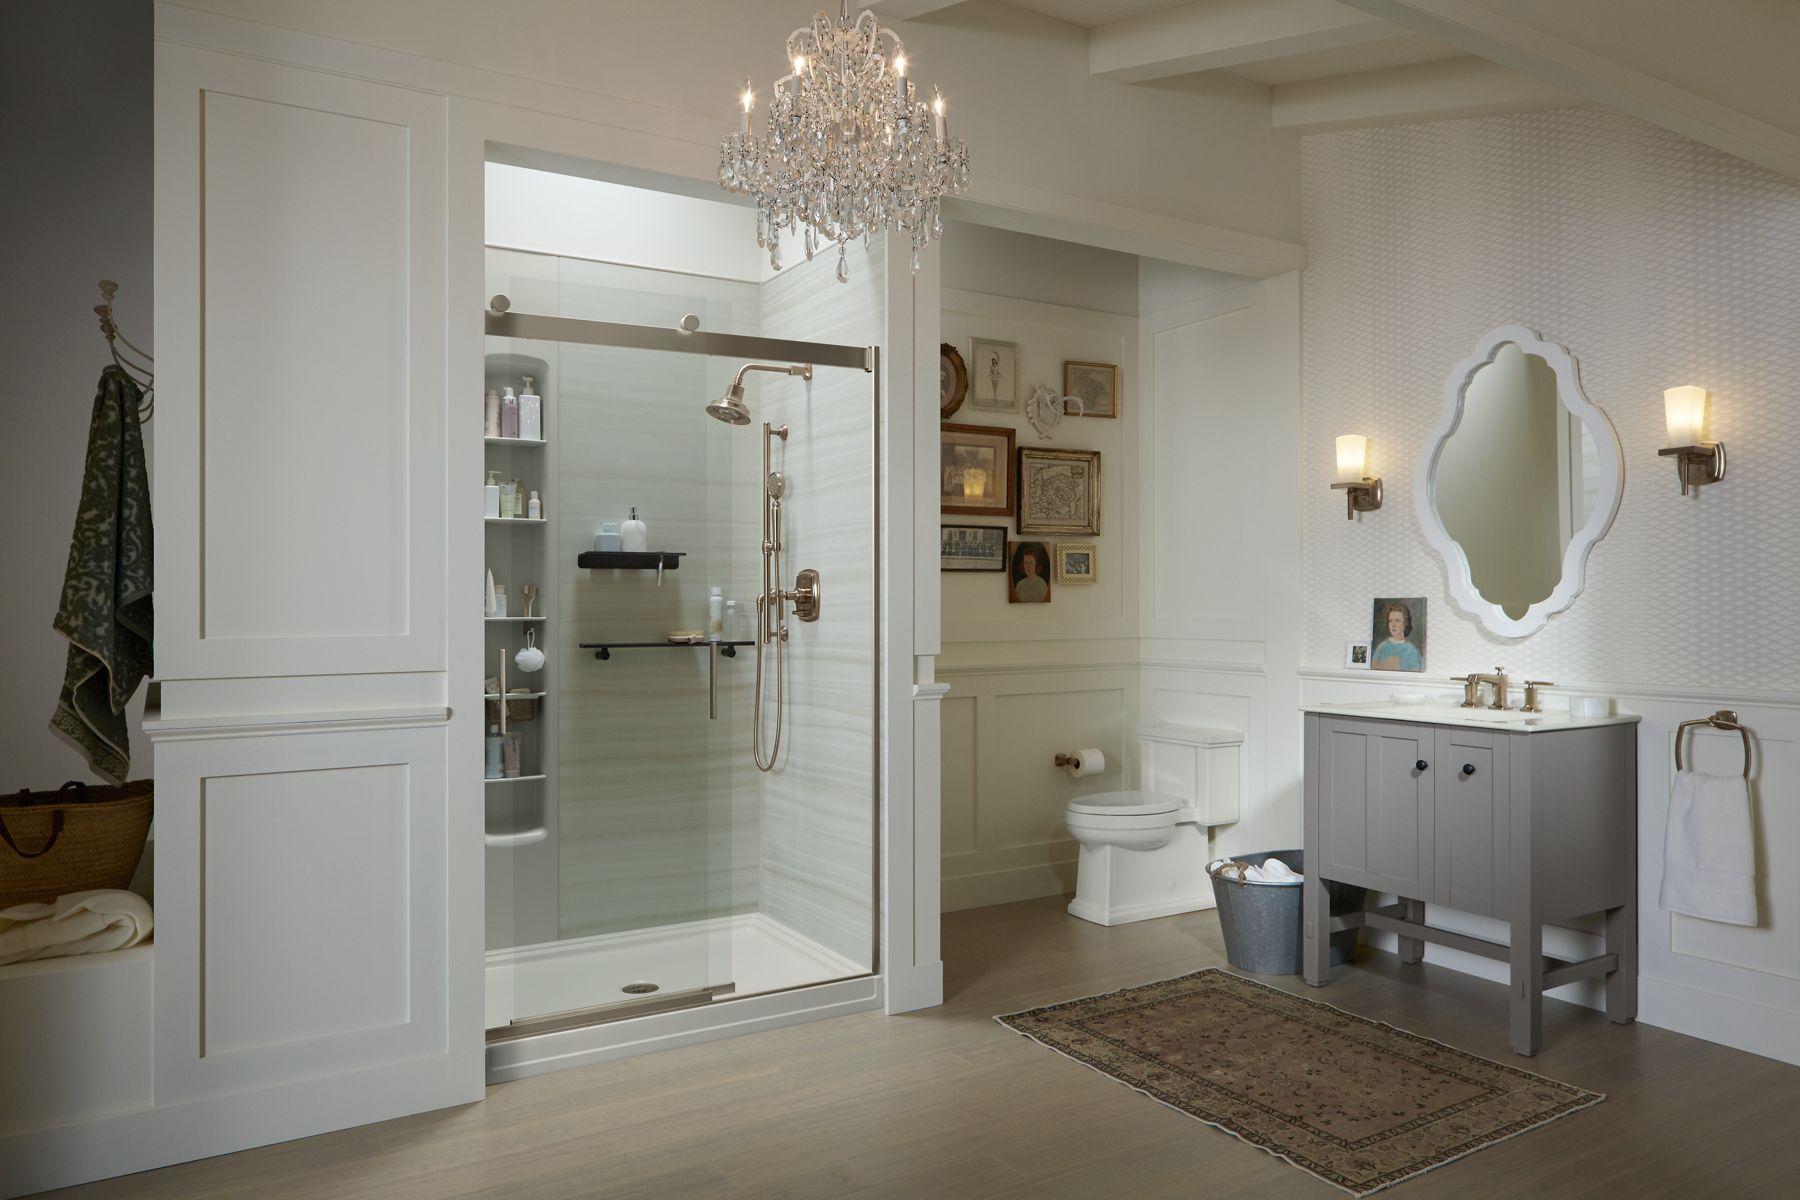 Frosted Shower Doors Showering Bathroom Kohler